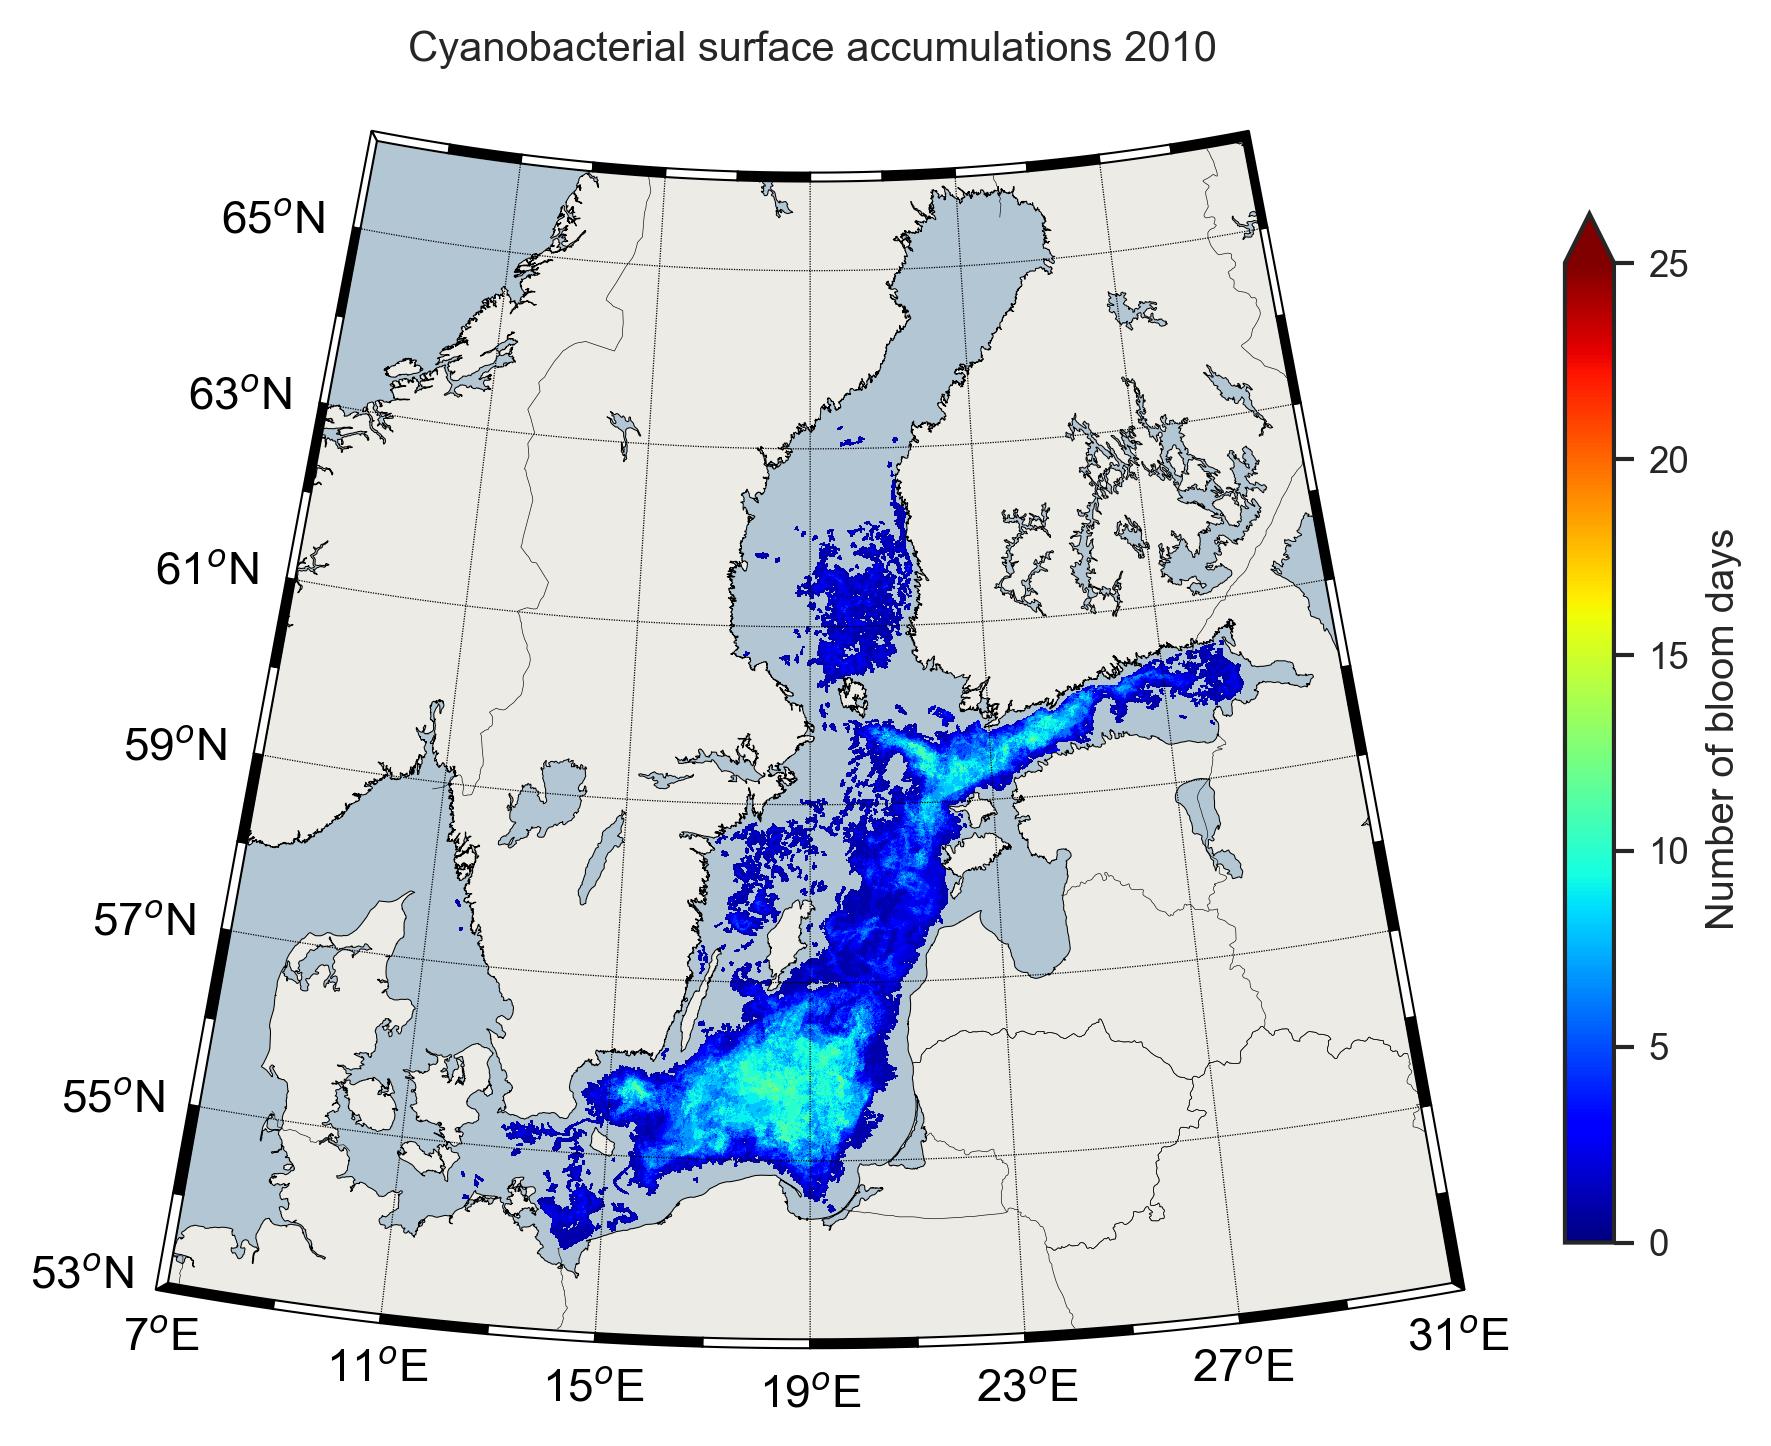 Karta över cyanobakterier 2010